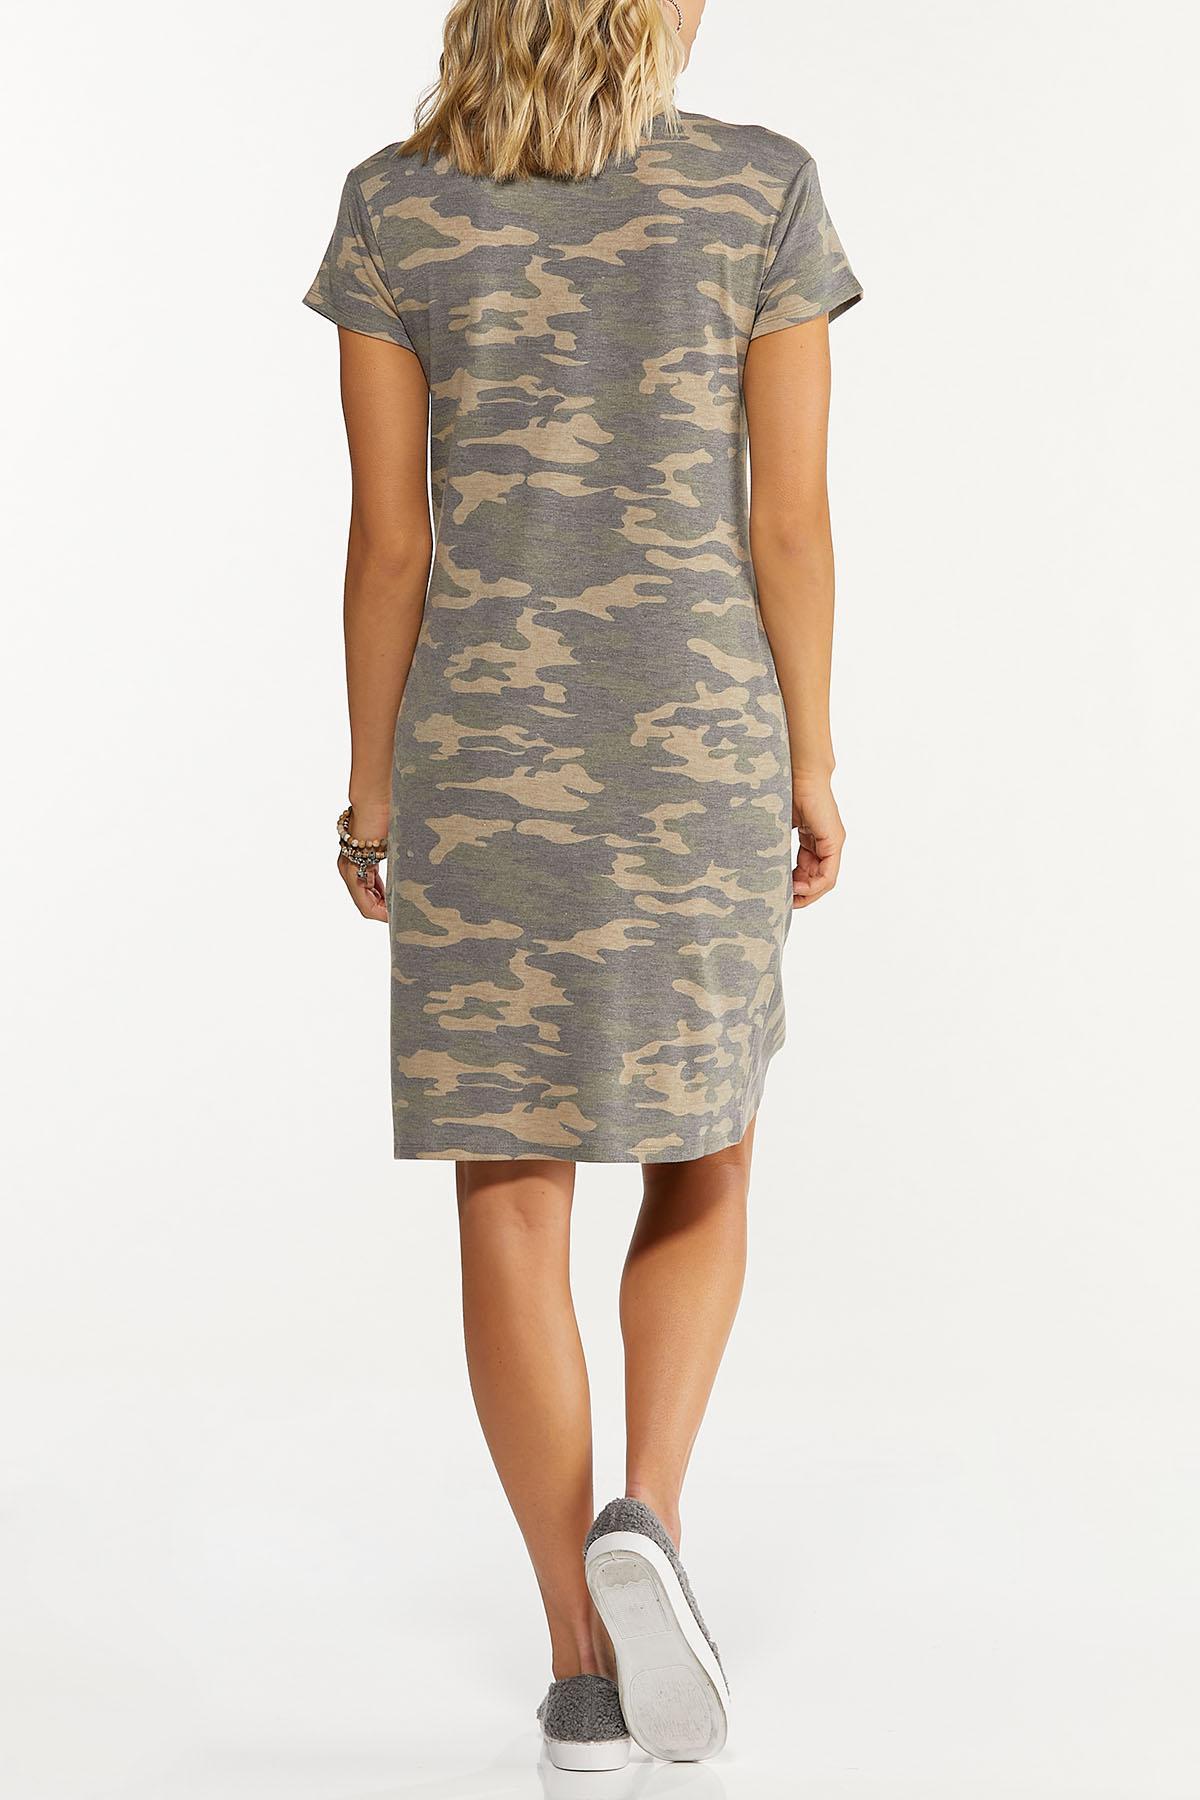 Twisted Camo Dress (Item #44655740)